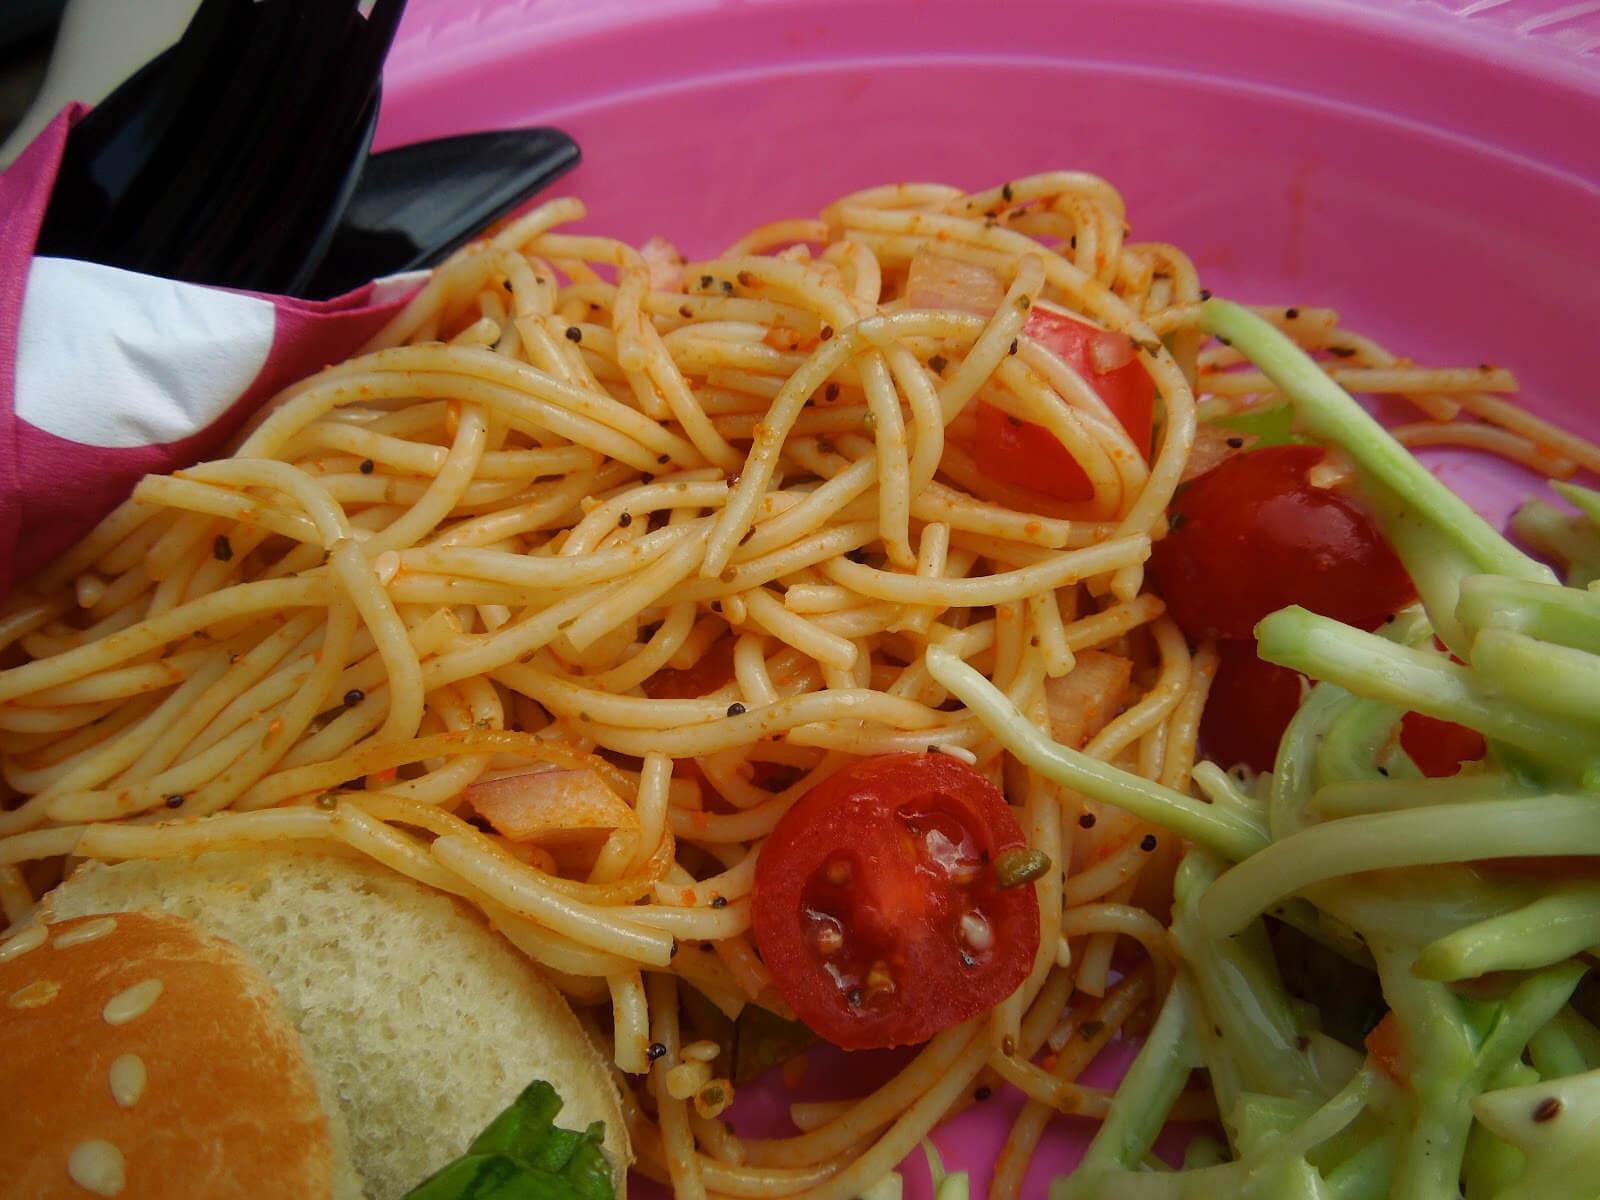 Spaghetti Salad Recipes  Cold Spaghetti Salad Recipe